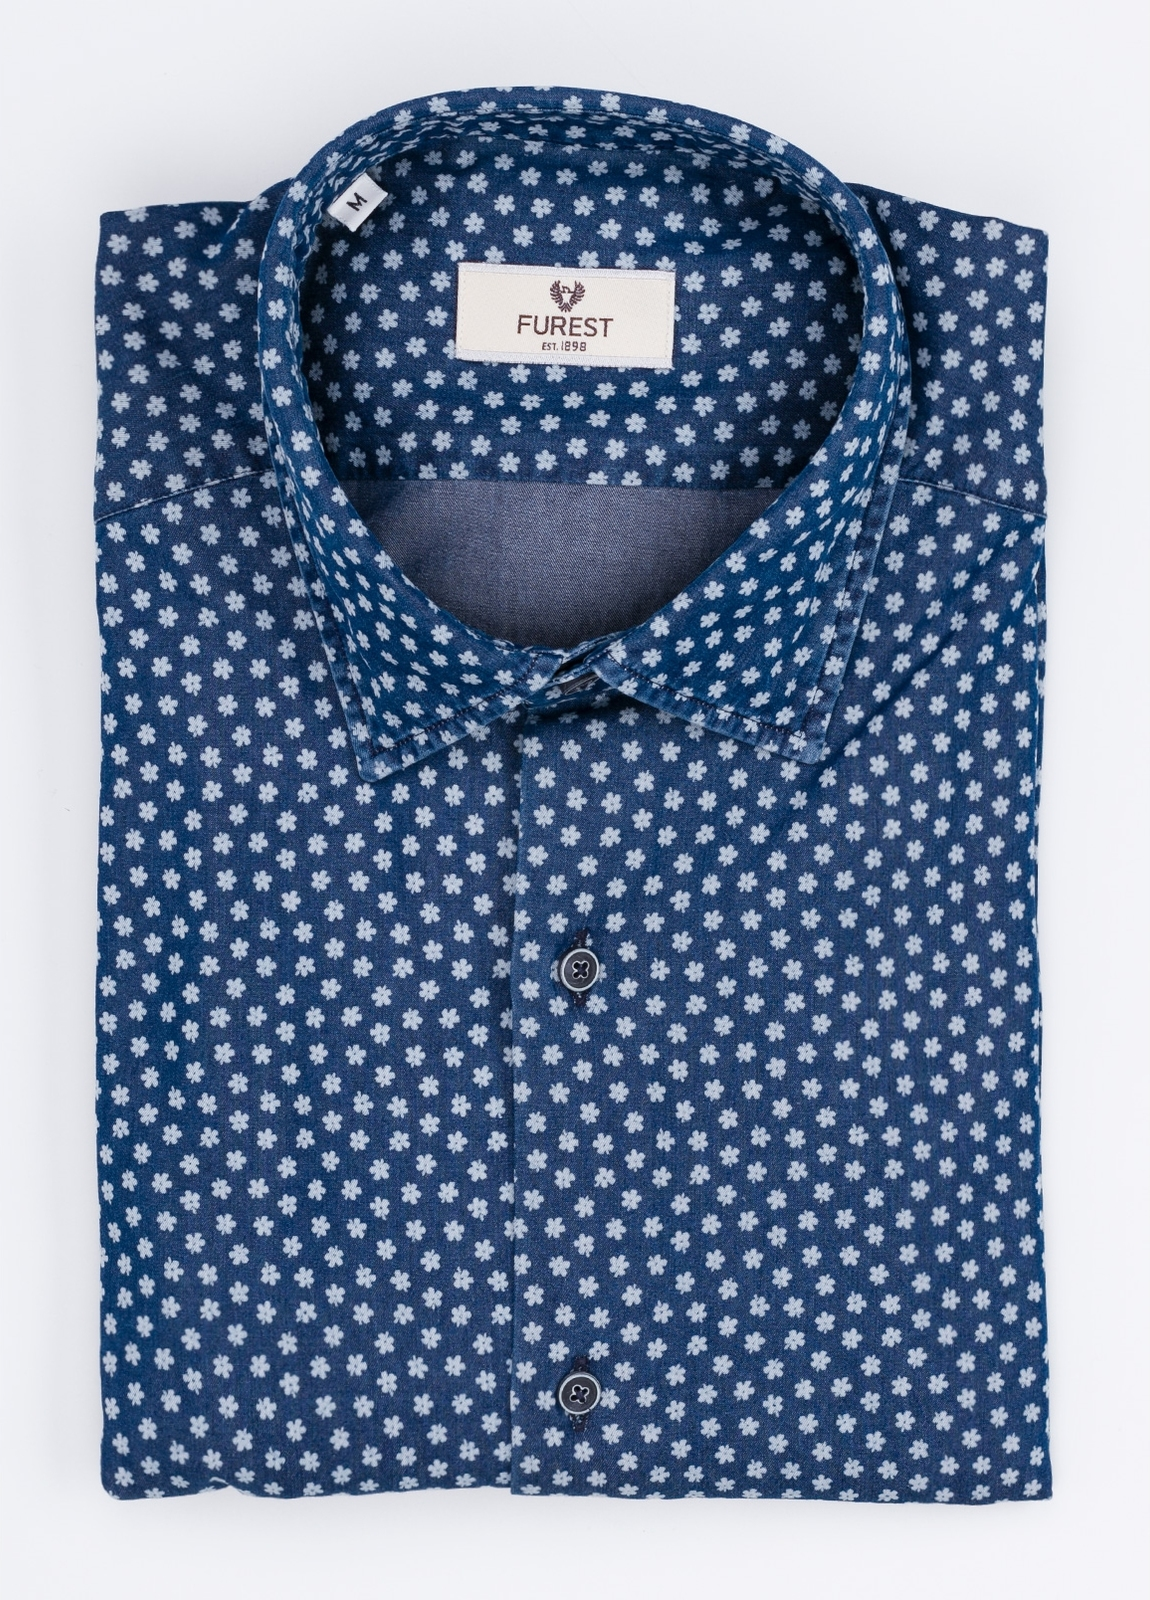 Camisa Leisure Wear SLIM FIT modelo PORTO dibujo floral, color azul. 100% Algodón.